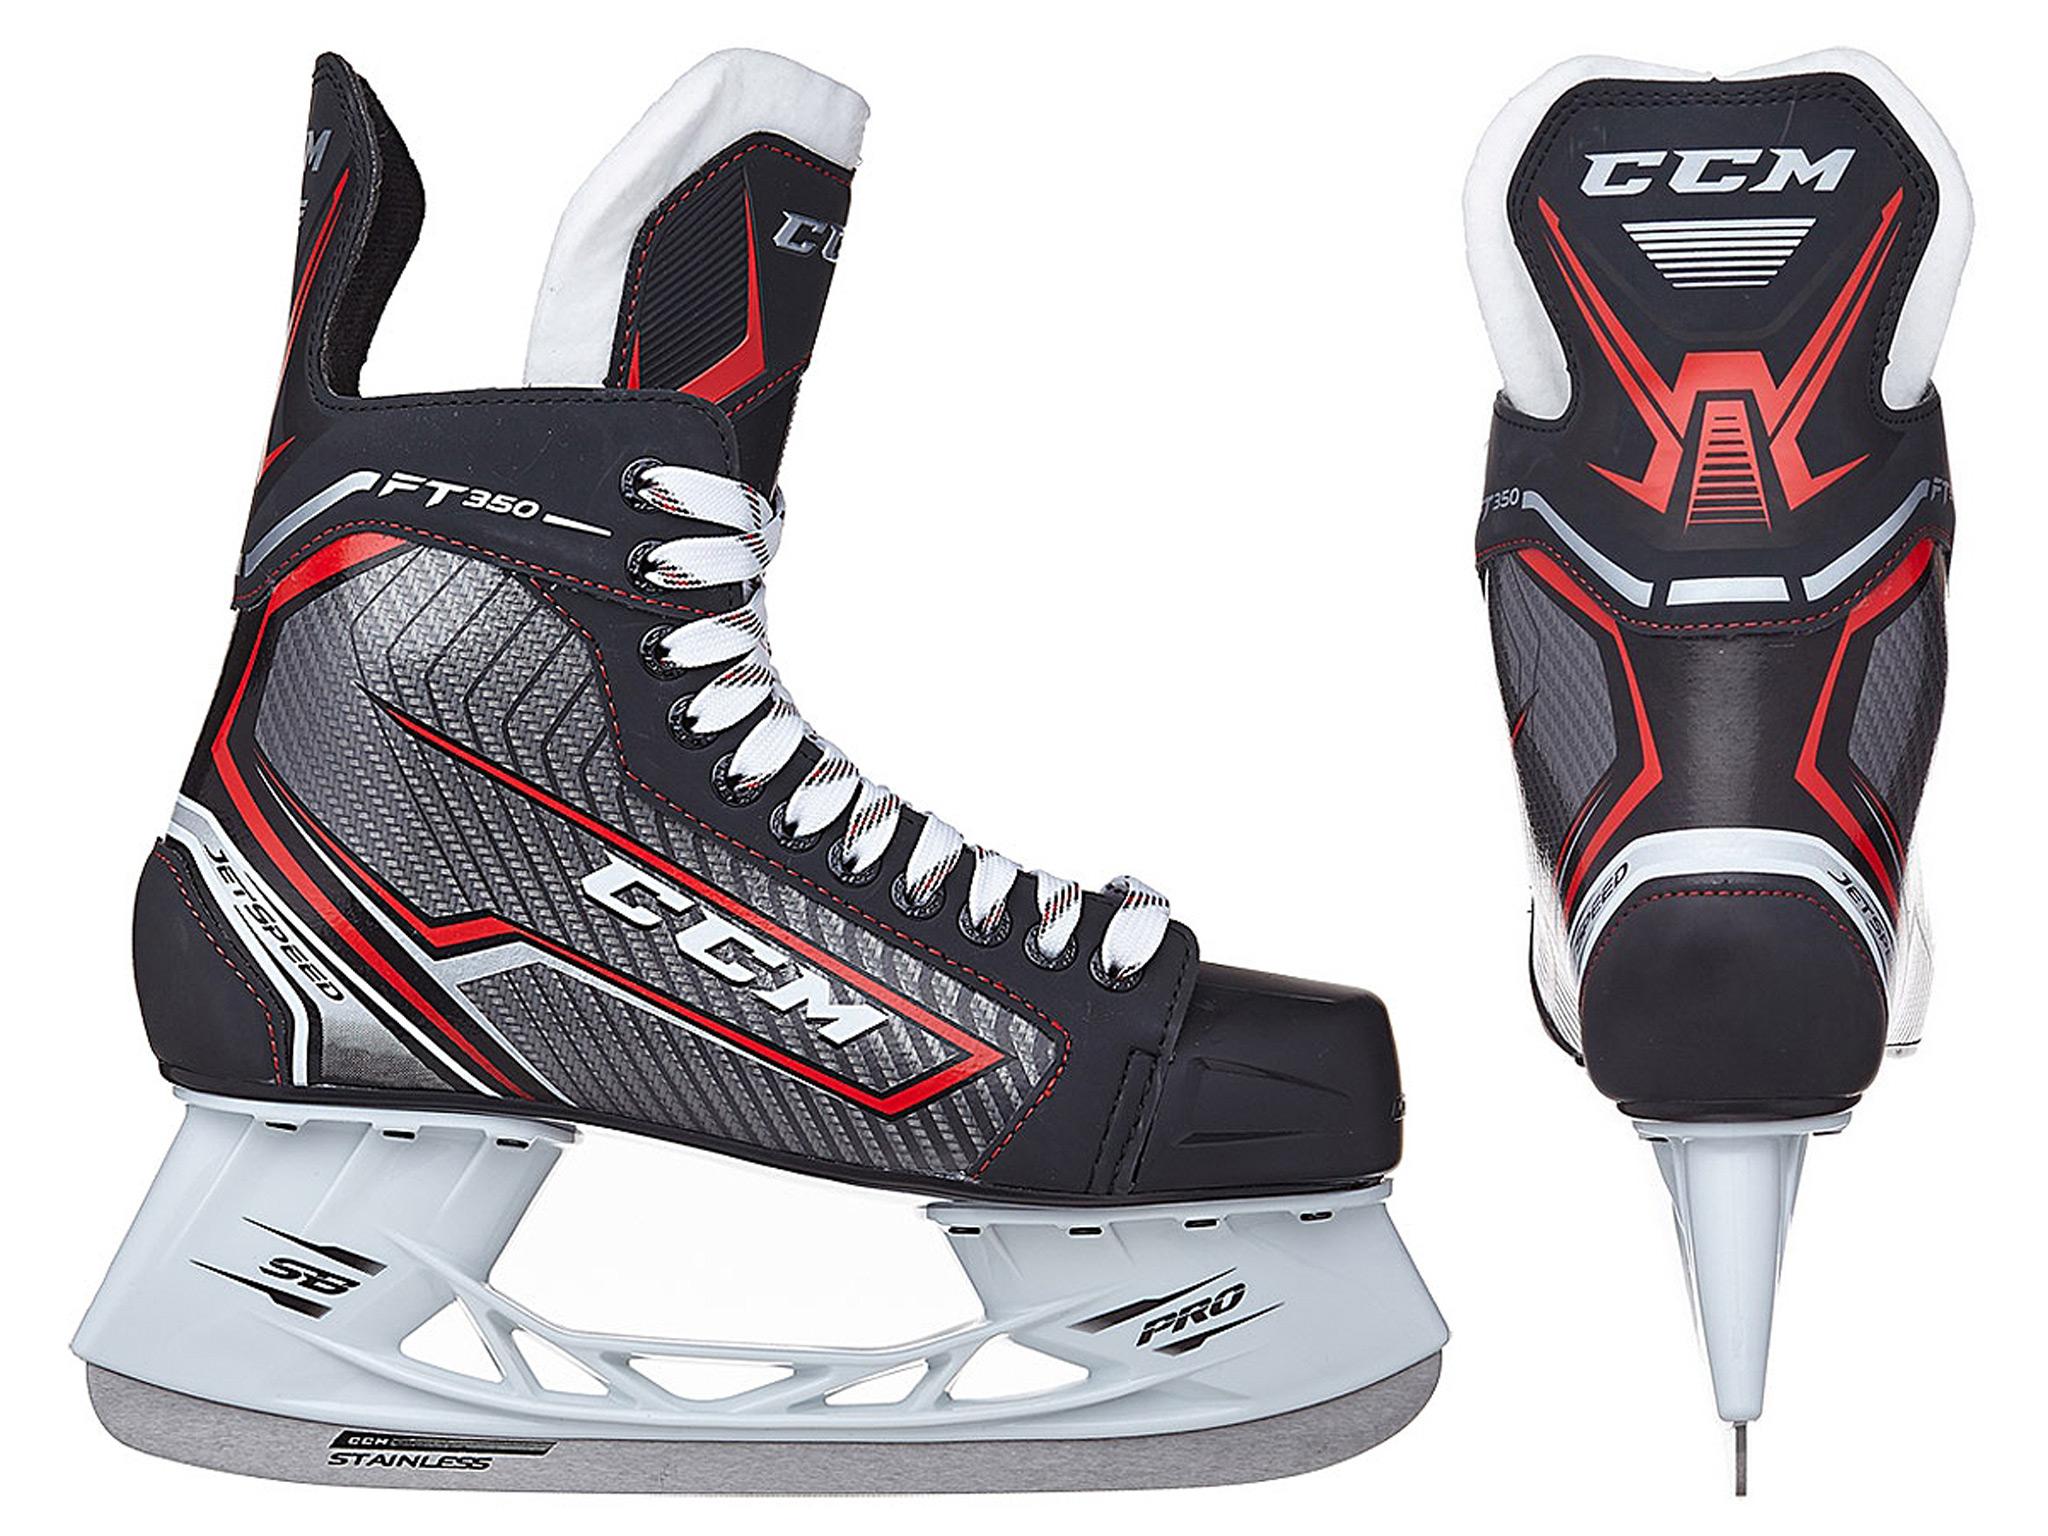 Hokejové korčule CCM JR JETSPEED FT350 - 38